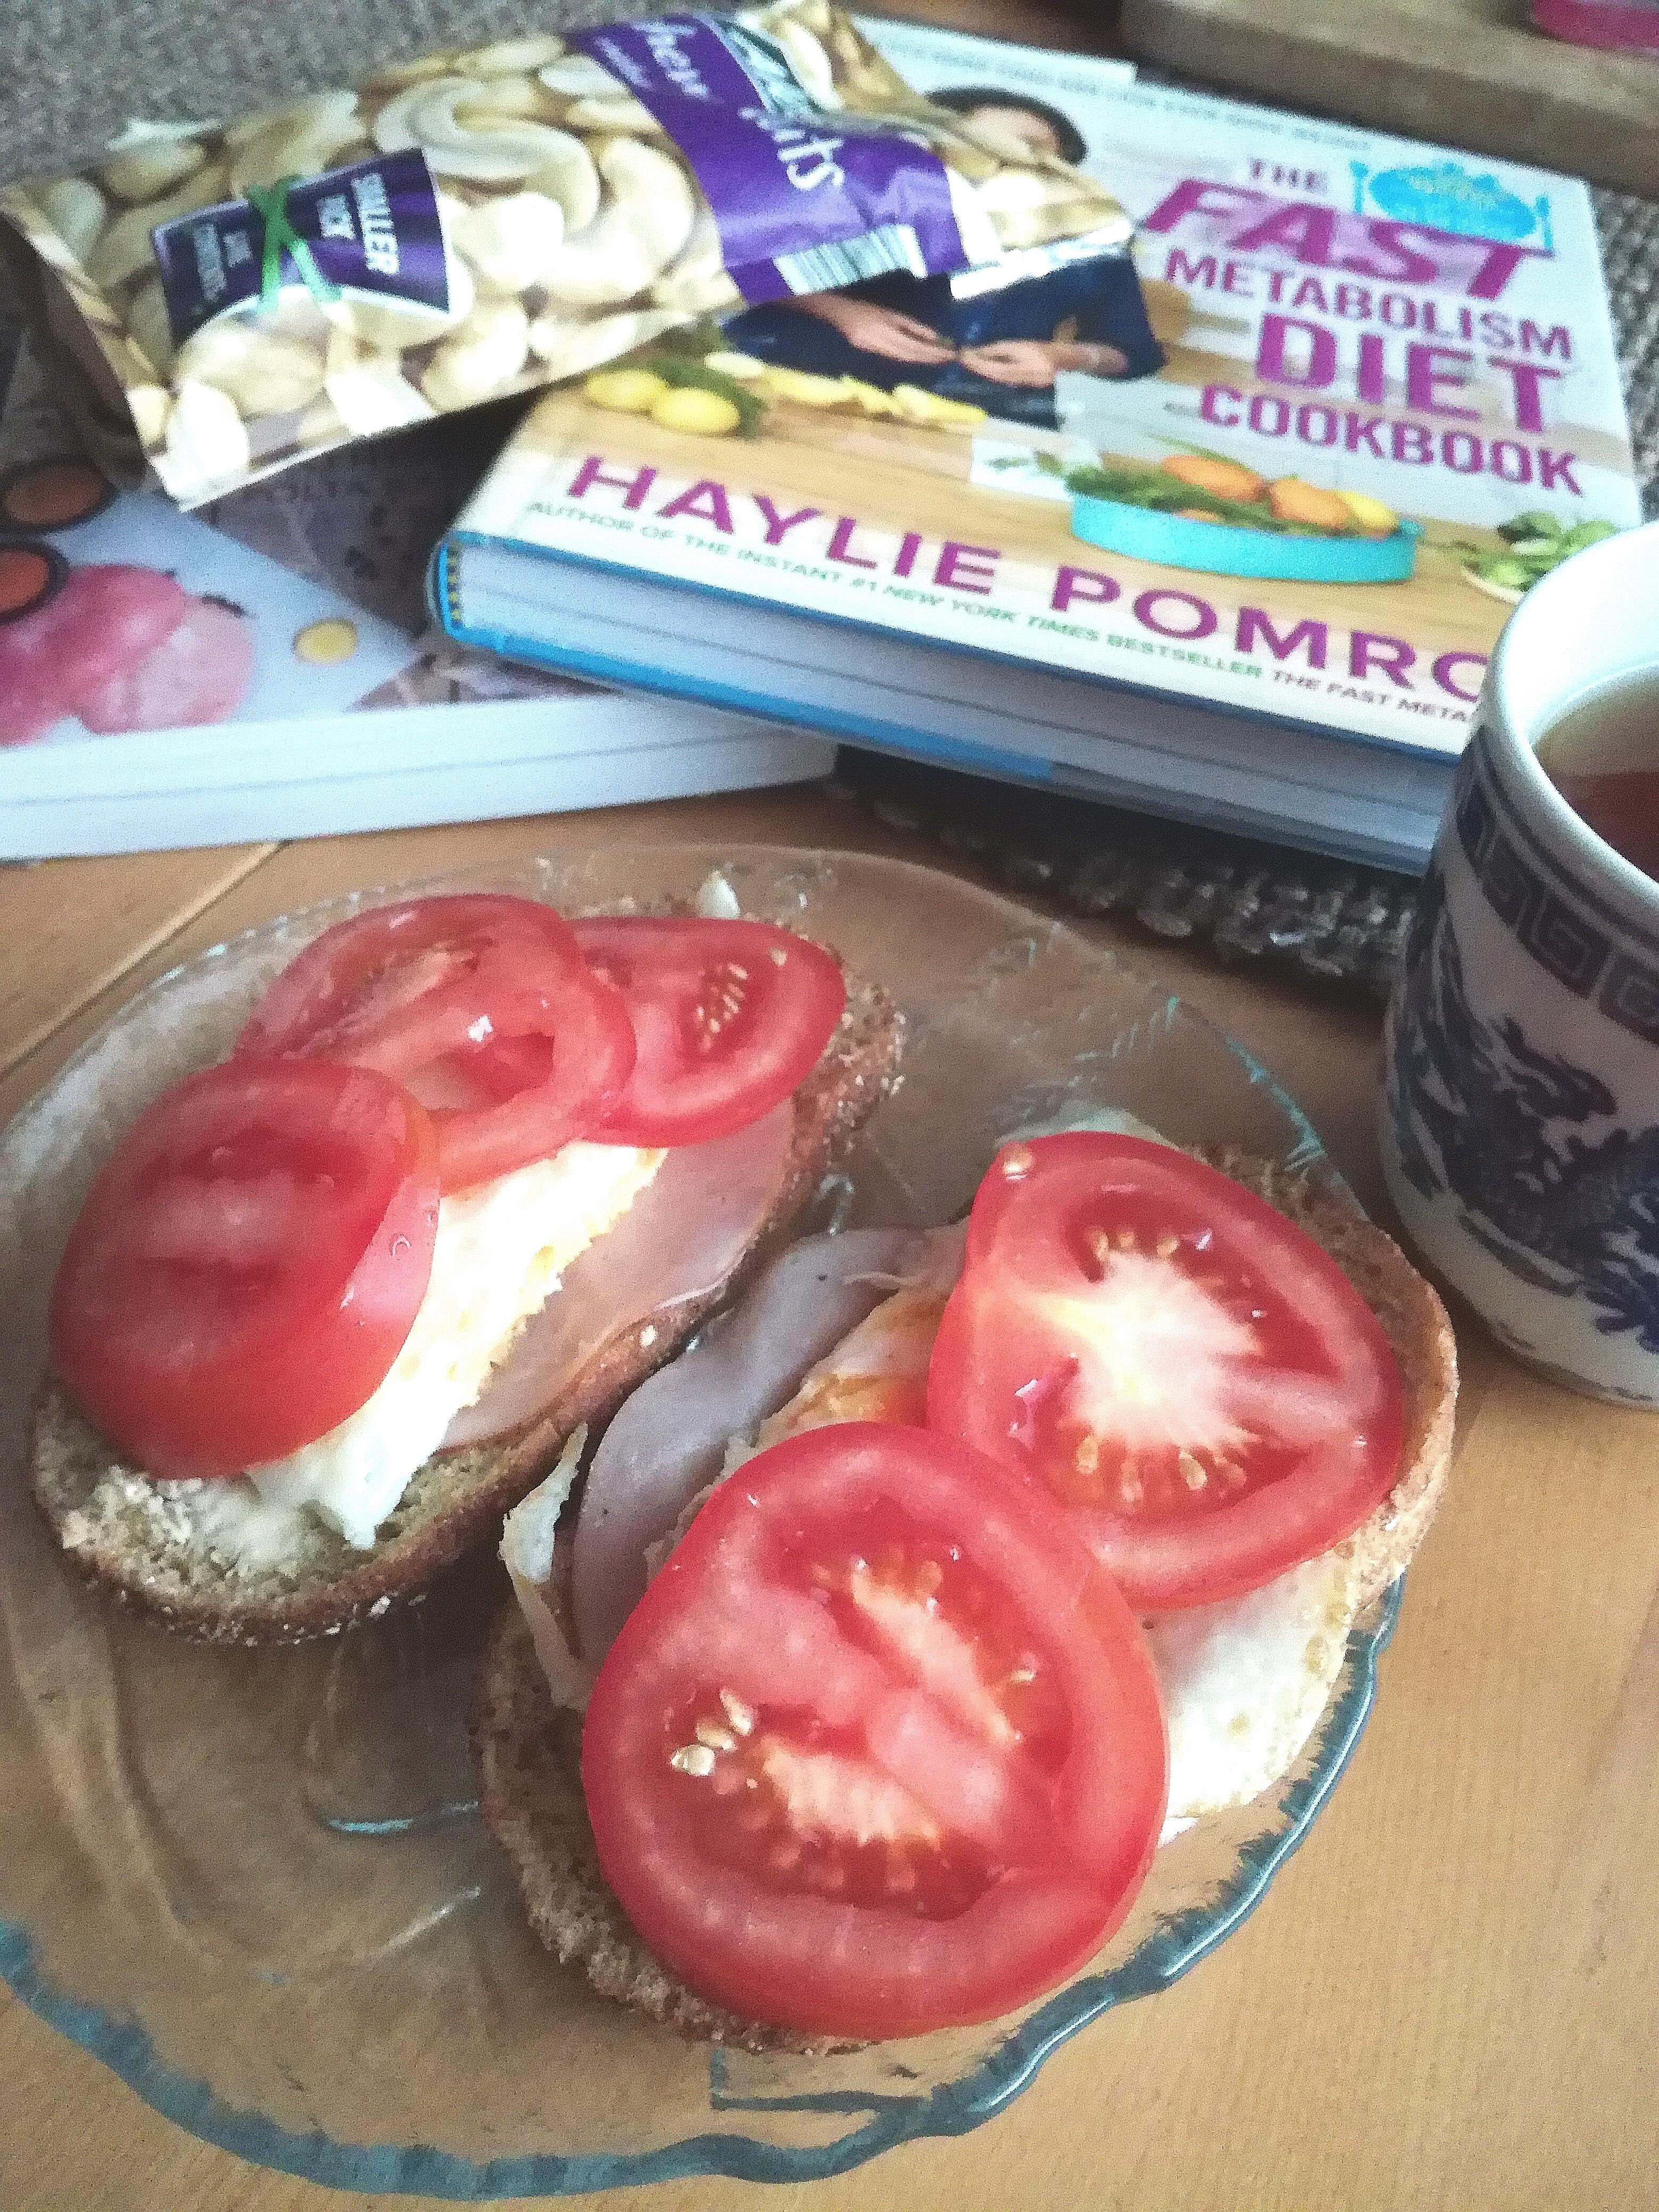 Nopean aineenvaihdunnan dieetin kertauskurssi, vaihe 3